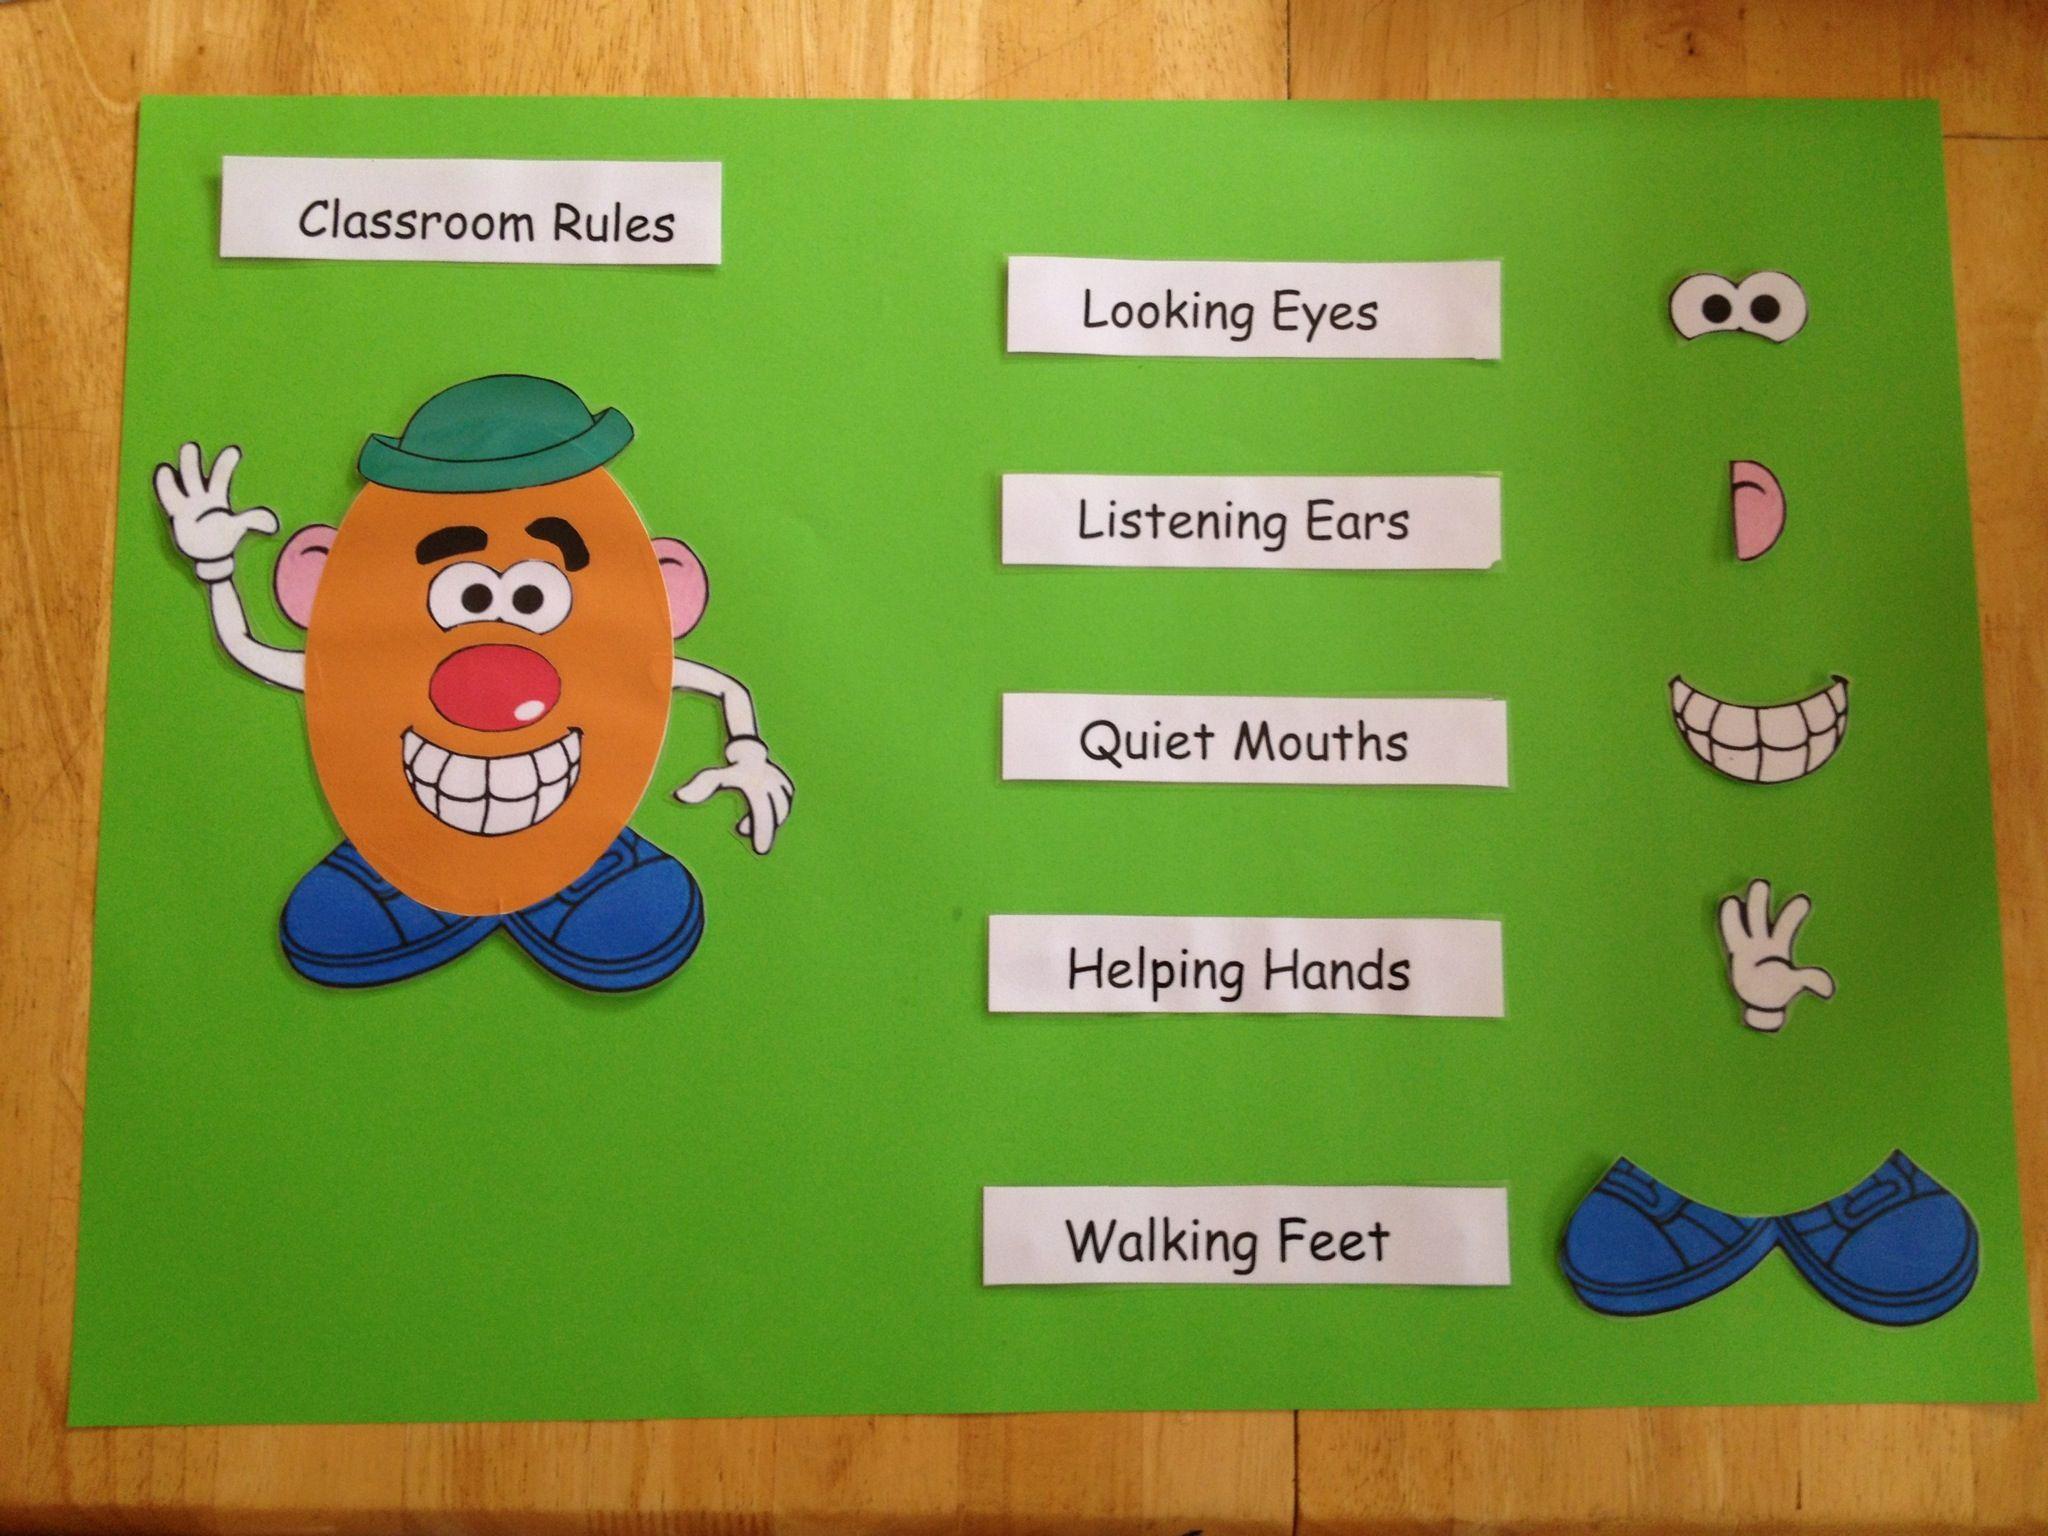 Classroom Rules - Mr Potato Head